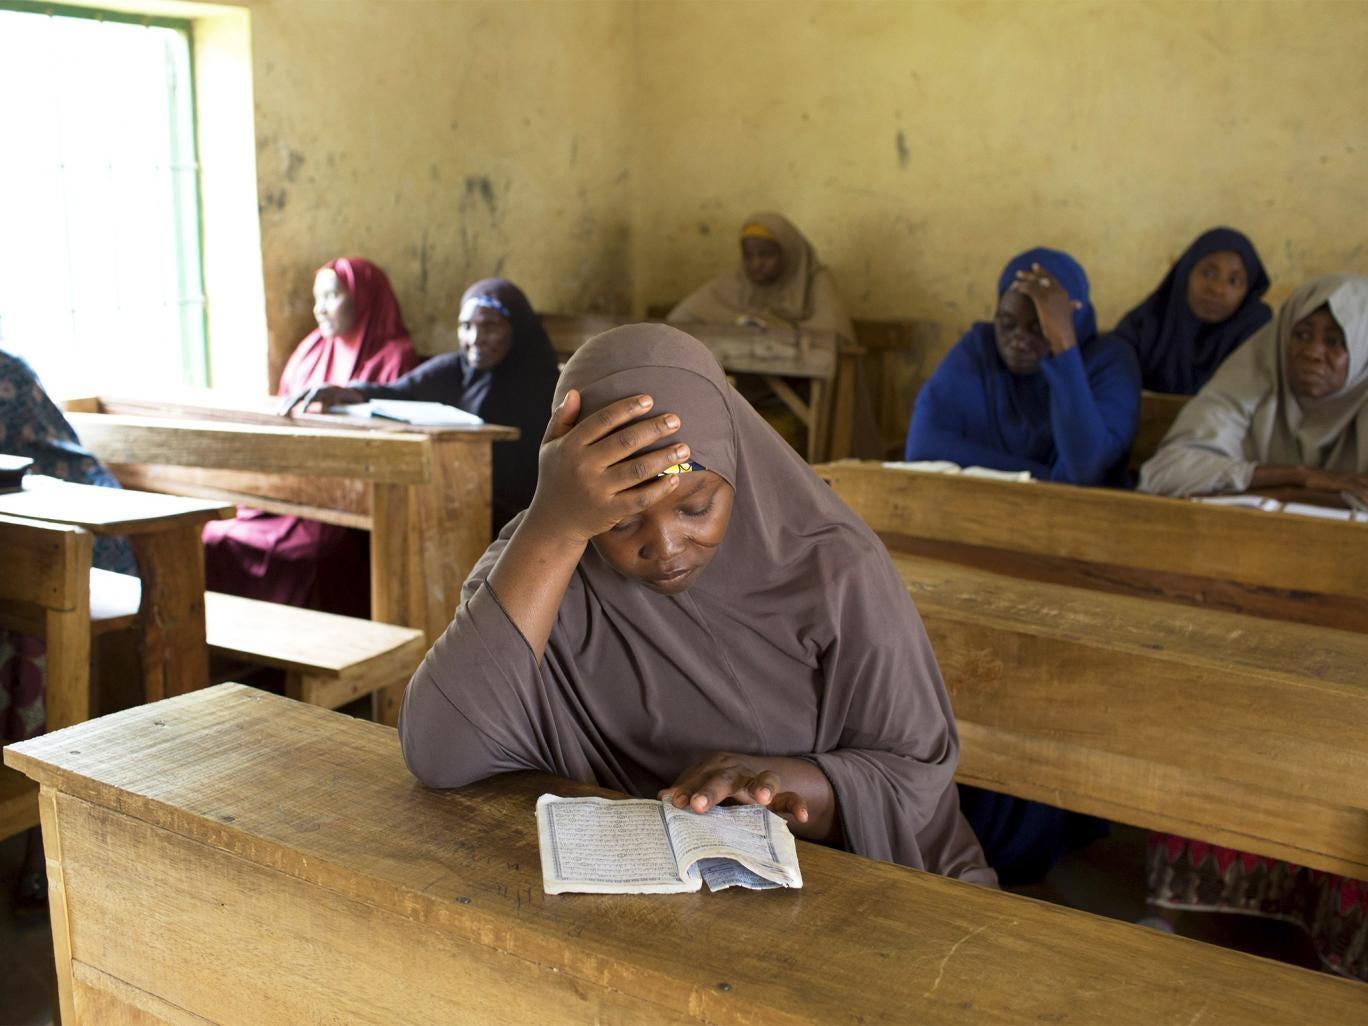 Women study at the Maska Road Islamic School in Kaduna